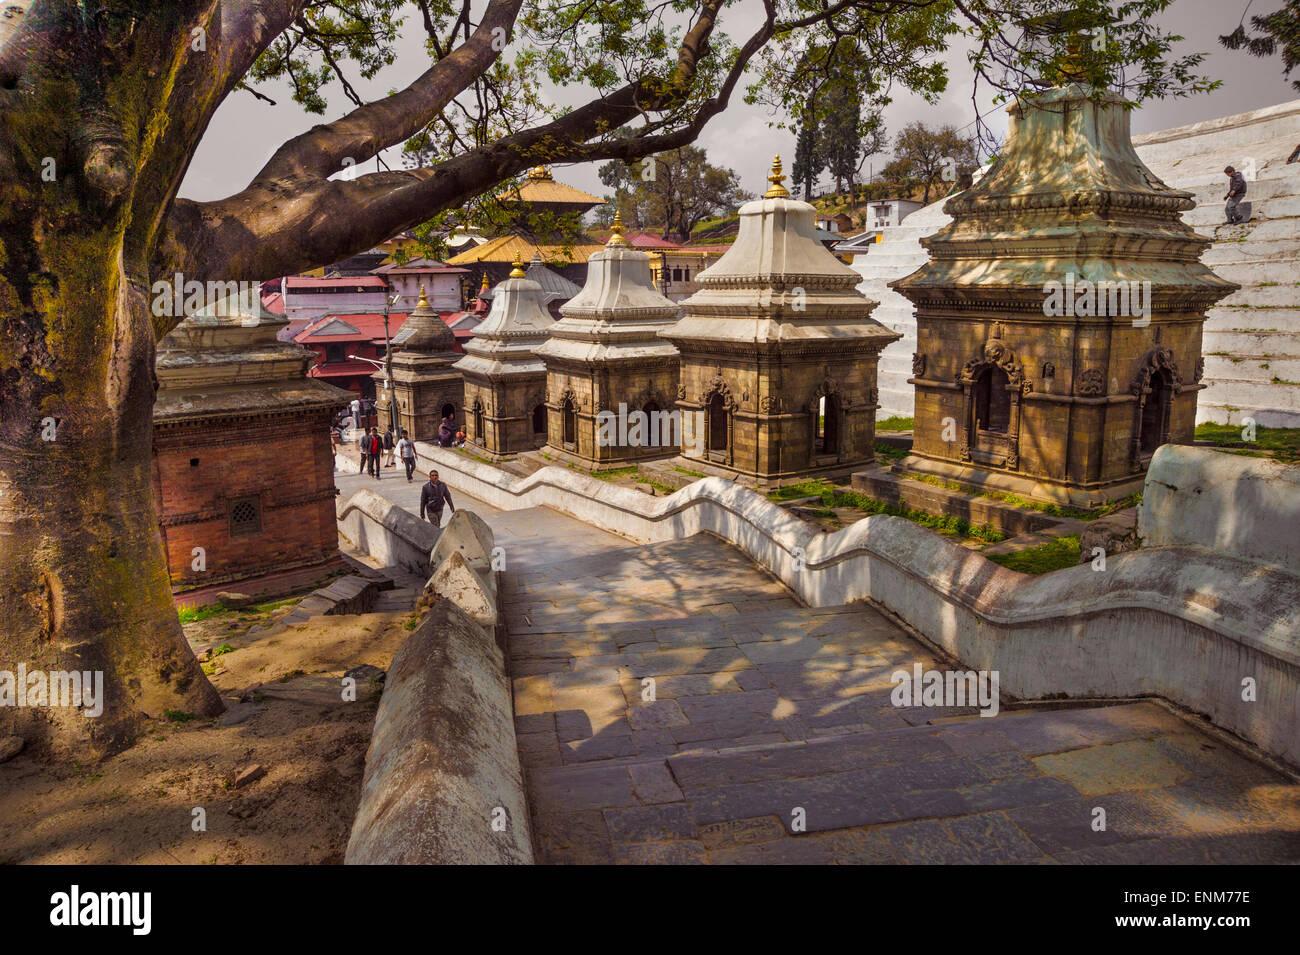 Chaityas at Pashupatinath Temple in Kathmandu, Nepal - Stock Image